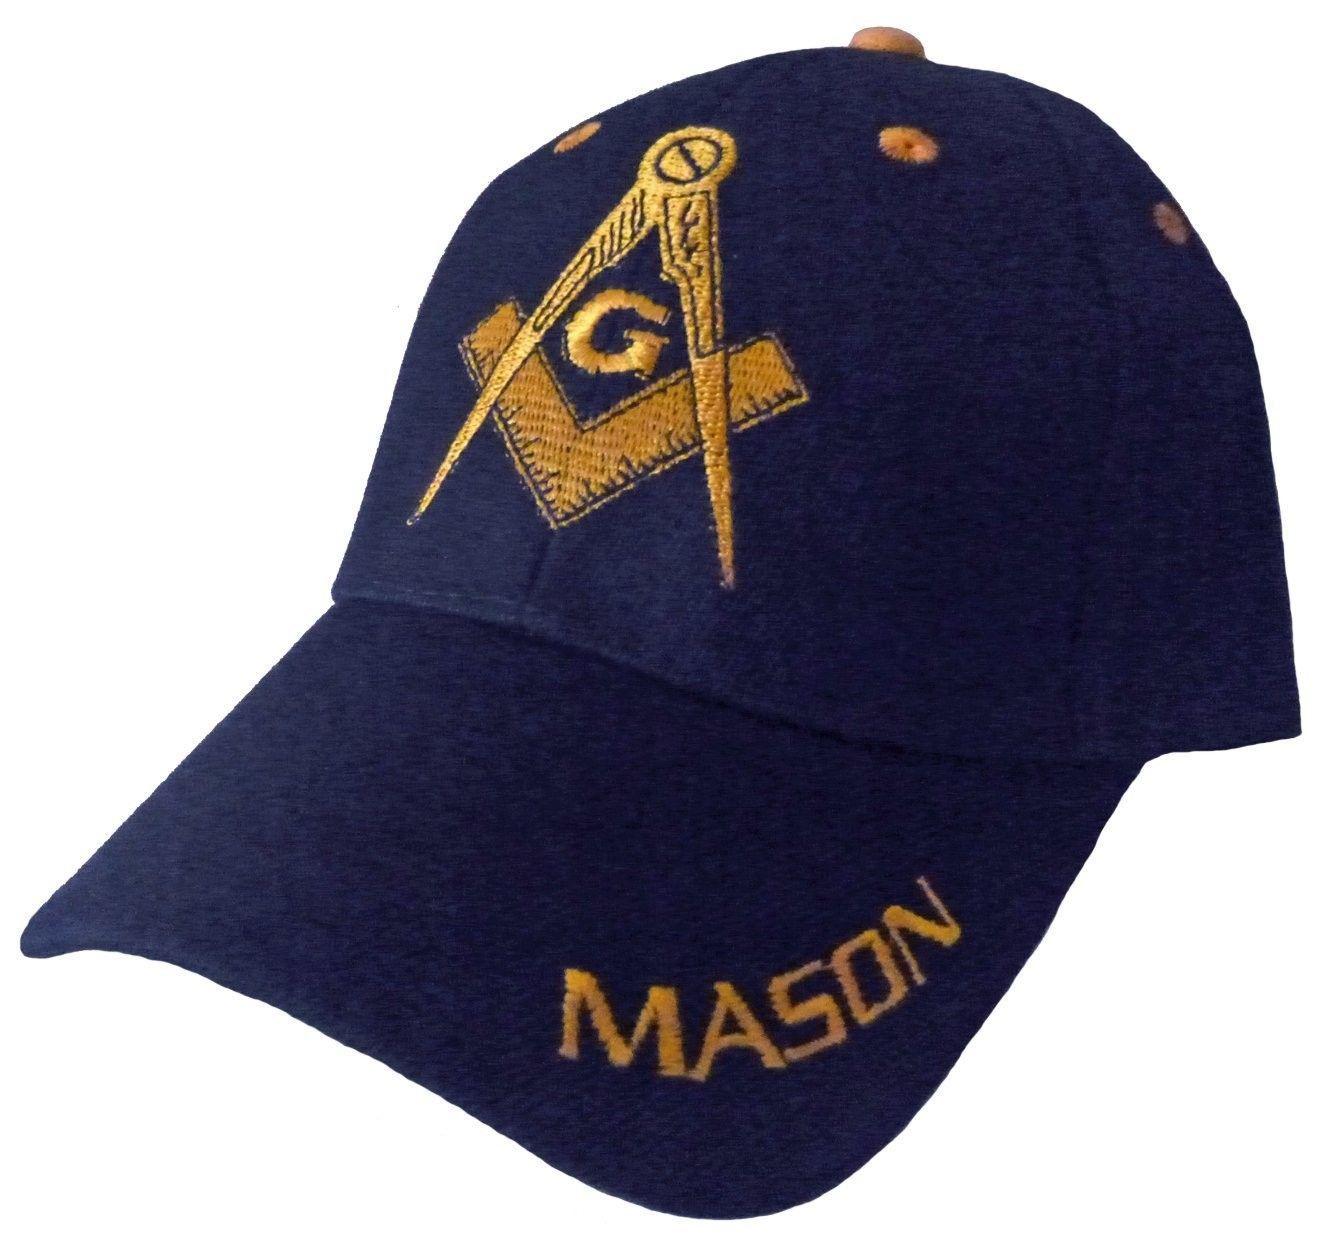 d58ecaac33344 Mason Hat Navy Blue Embroidered Masonic Lodge Freemasons Baseball Cap -  CE11F0TMCKT - Hats   Caps